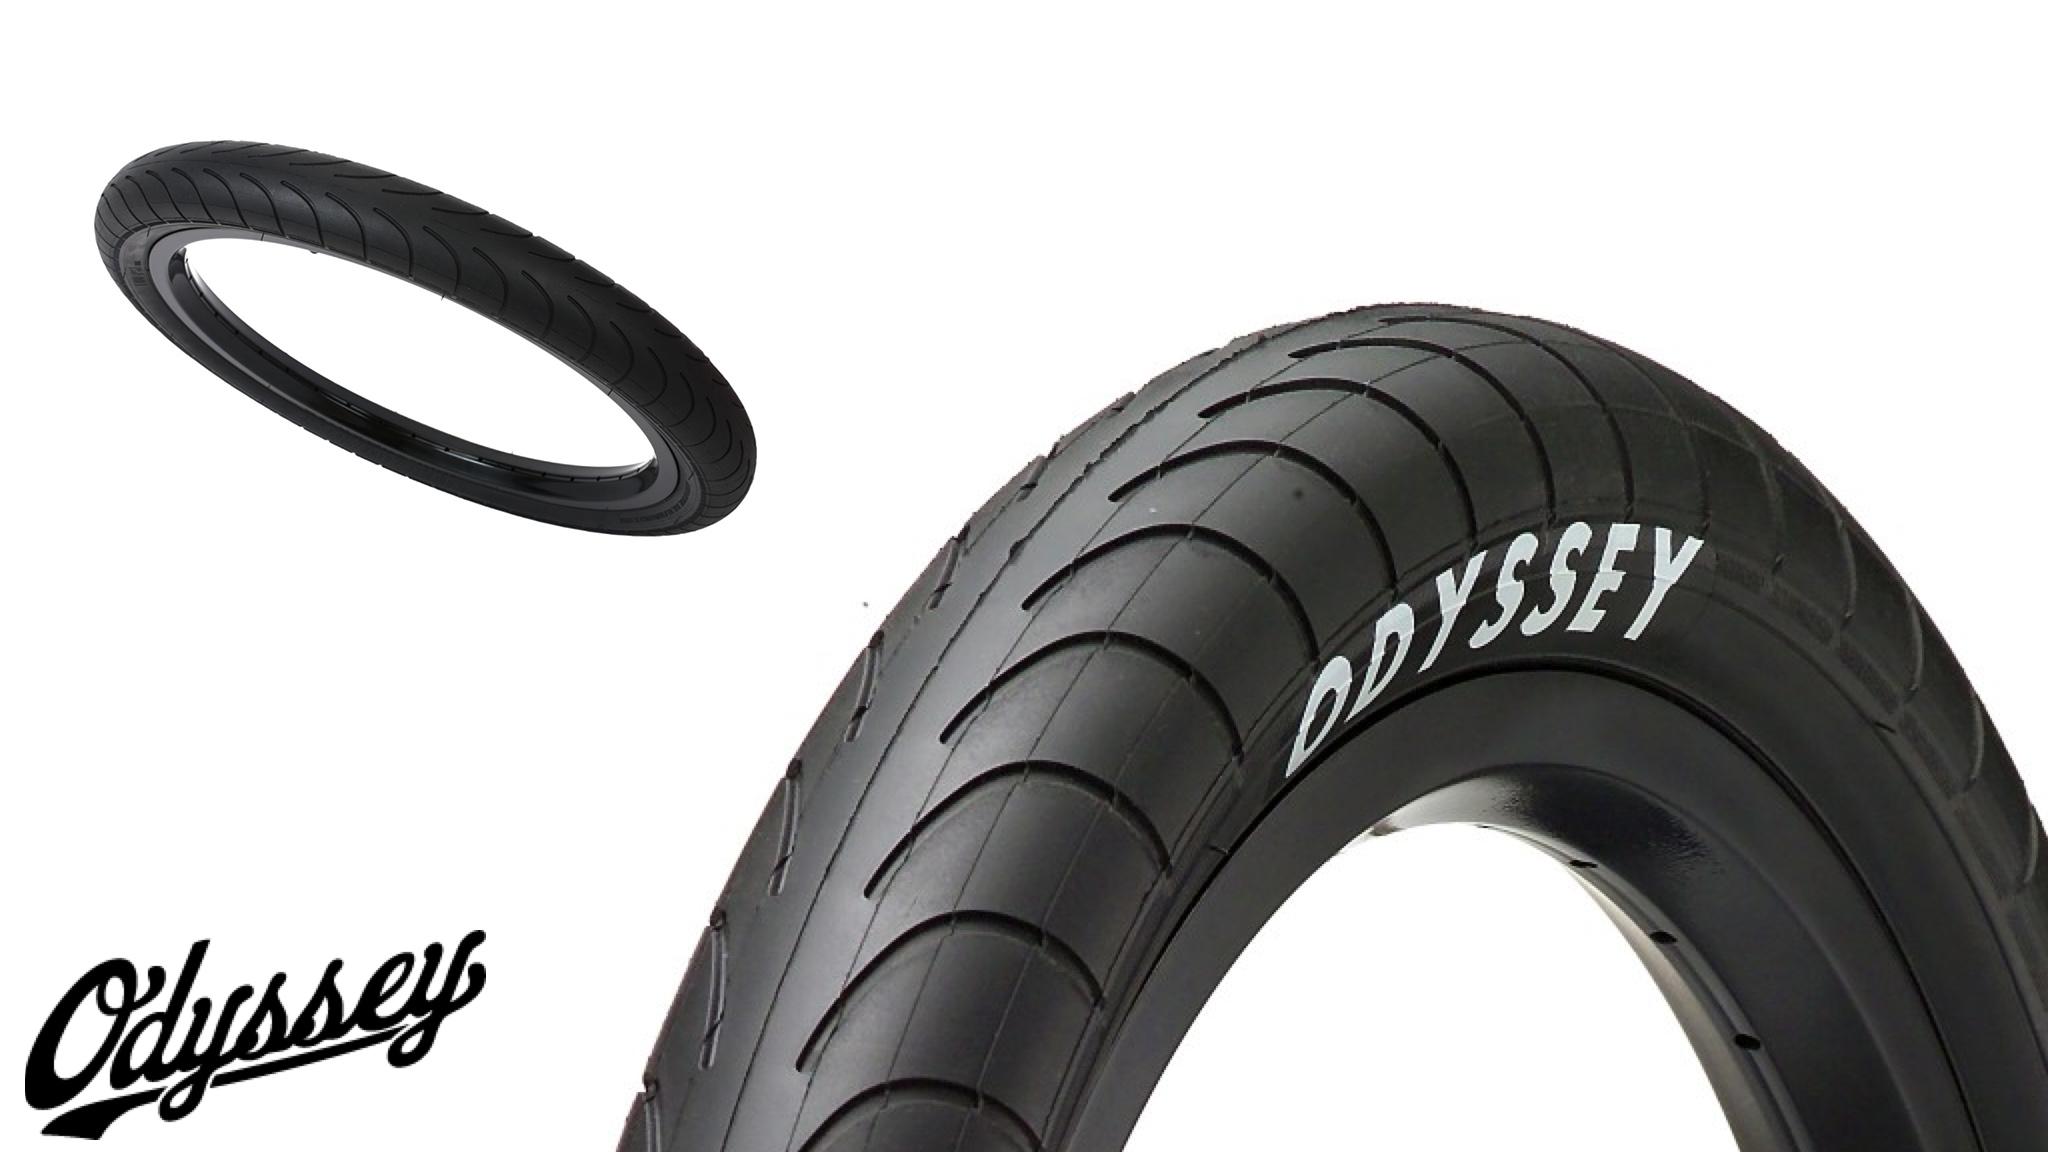 Odyssey Chase Hawk tire